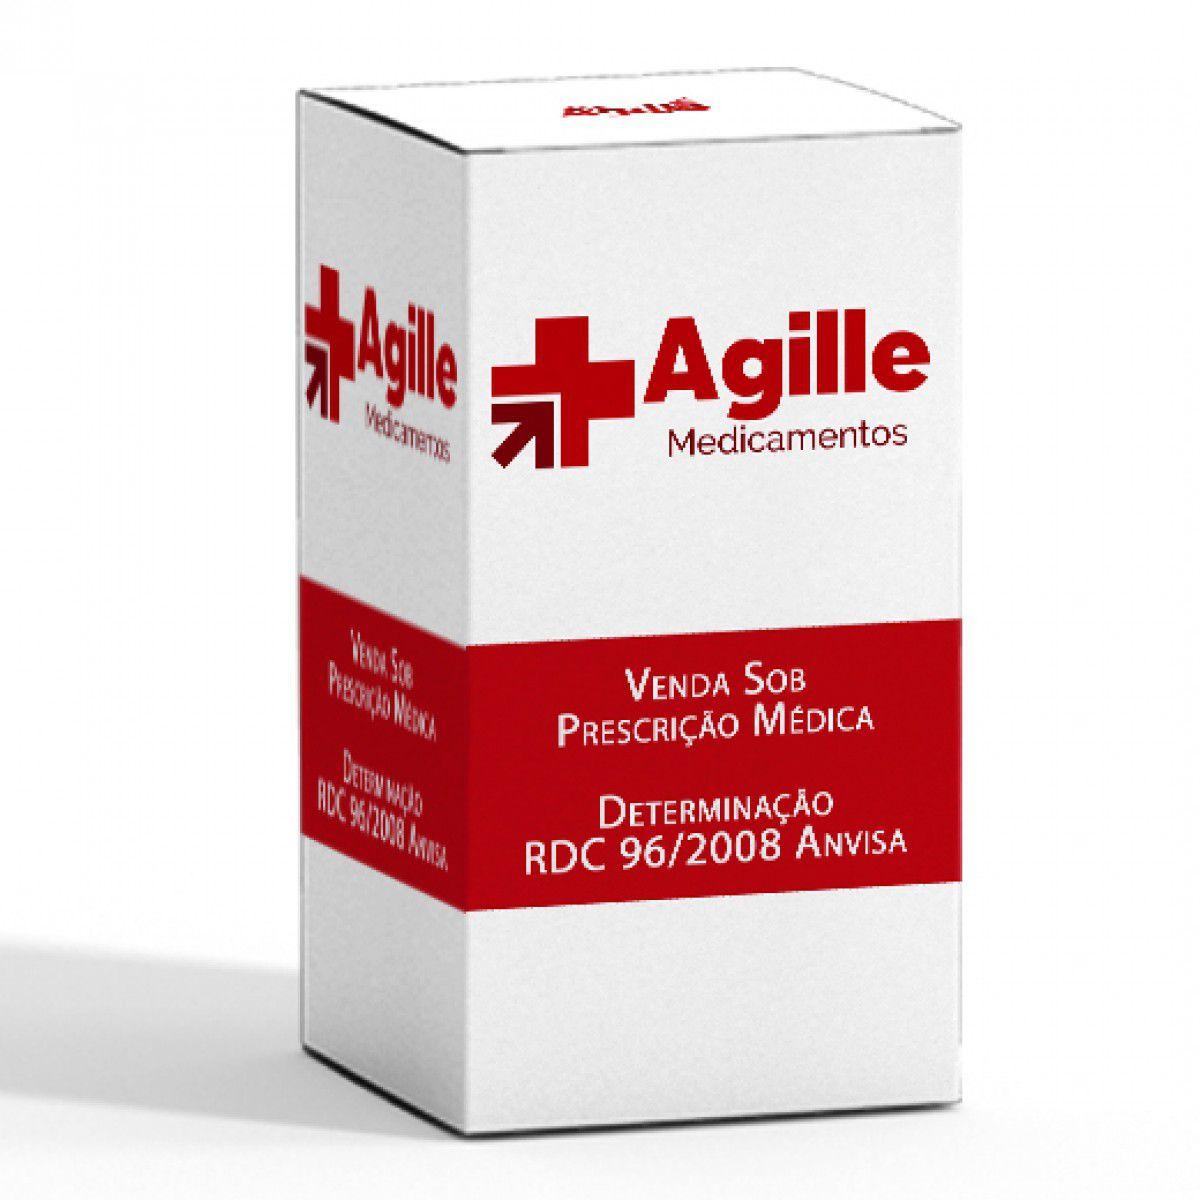 DERSANI HIDROGEL 30G  - Agille Speciality